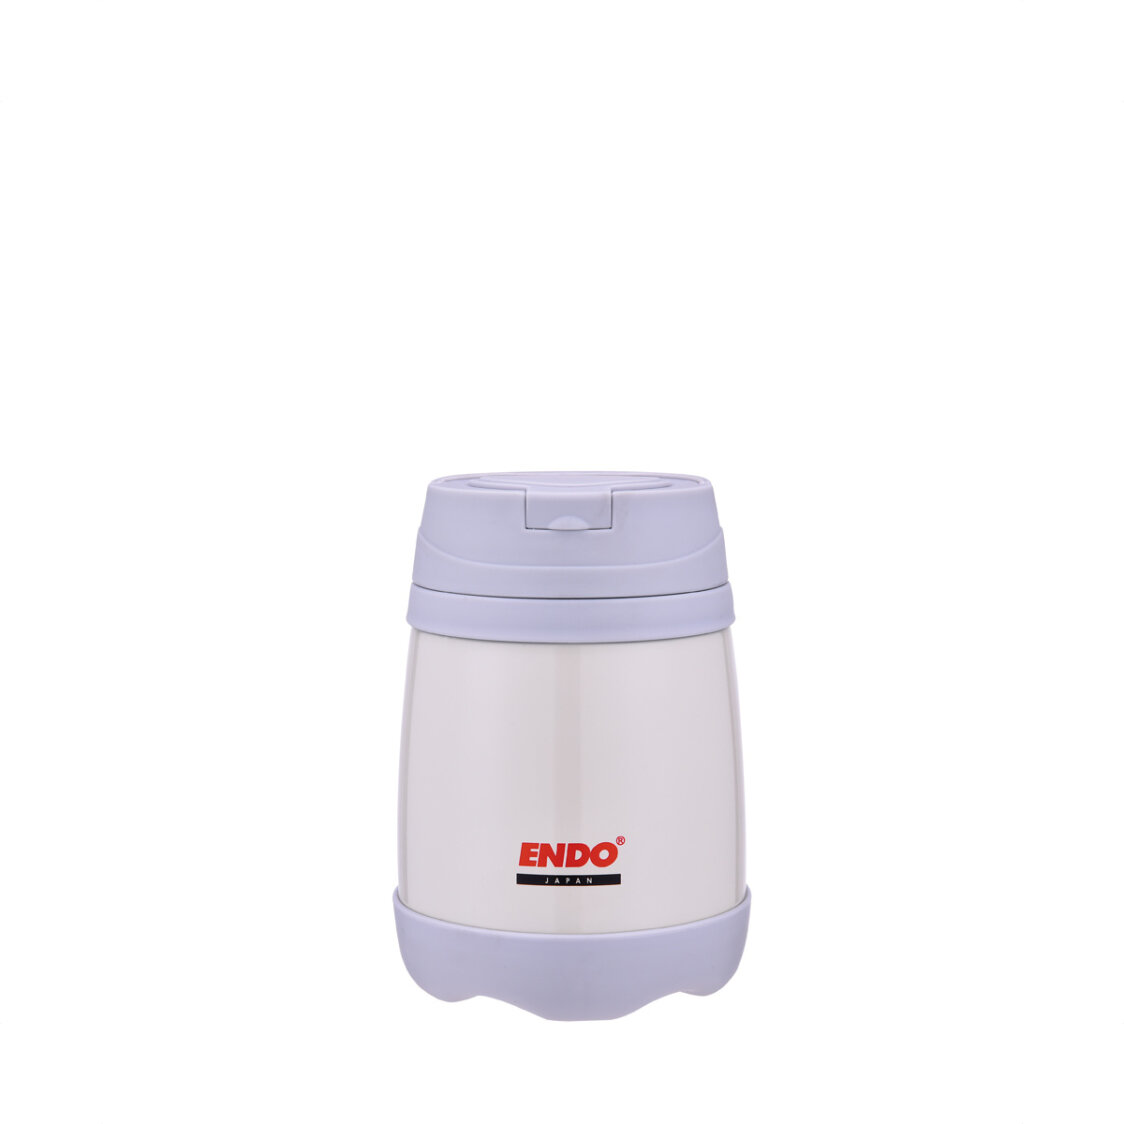 Endo 500ml Double SSteel Food Jar Pearl White